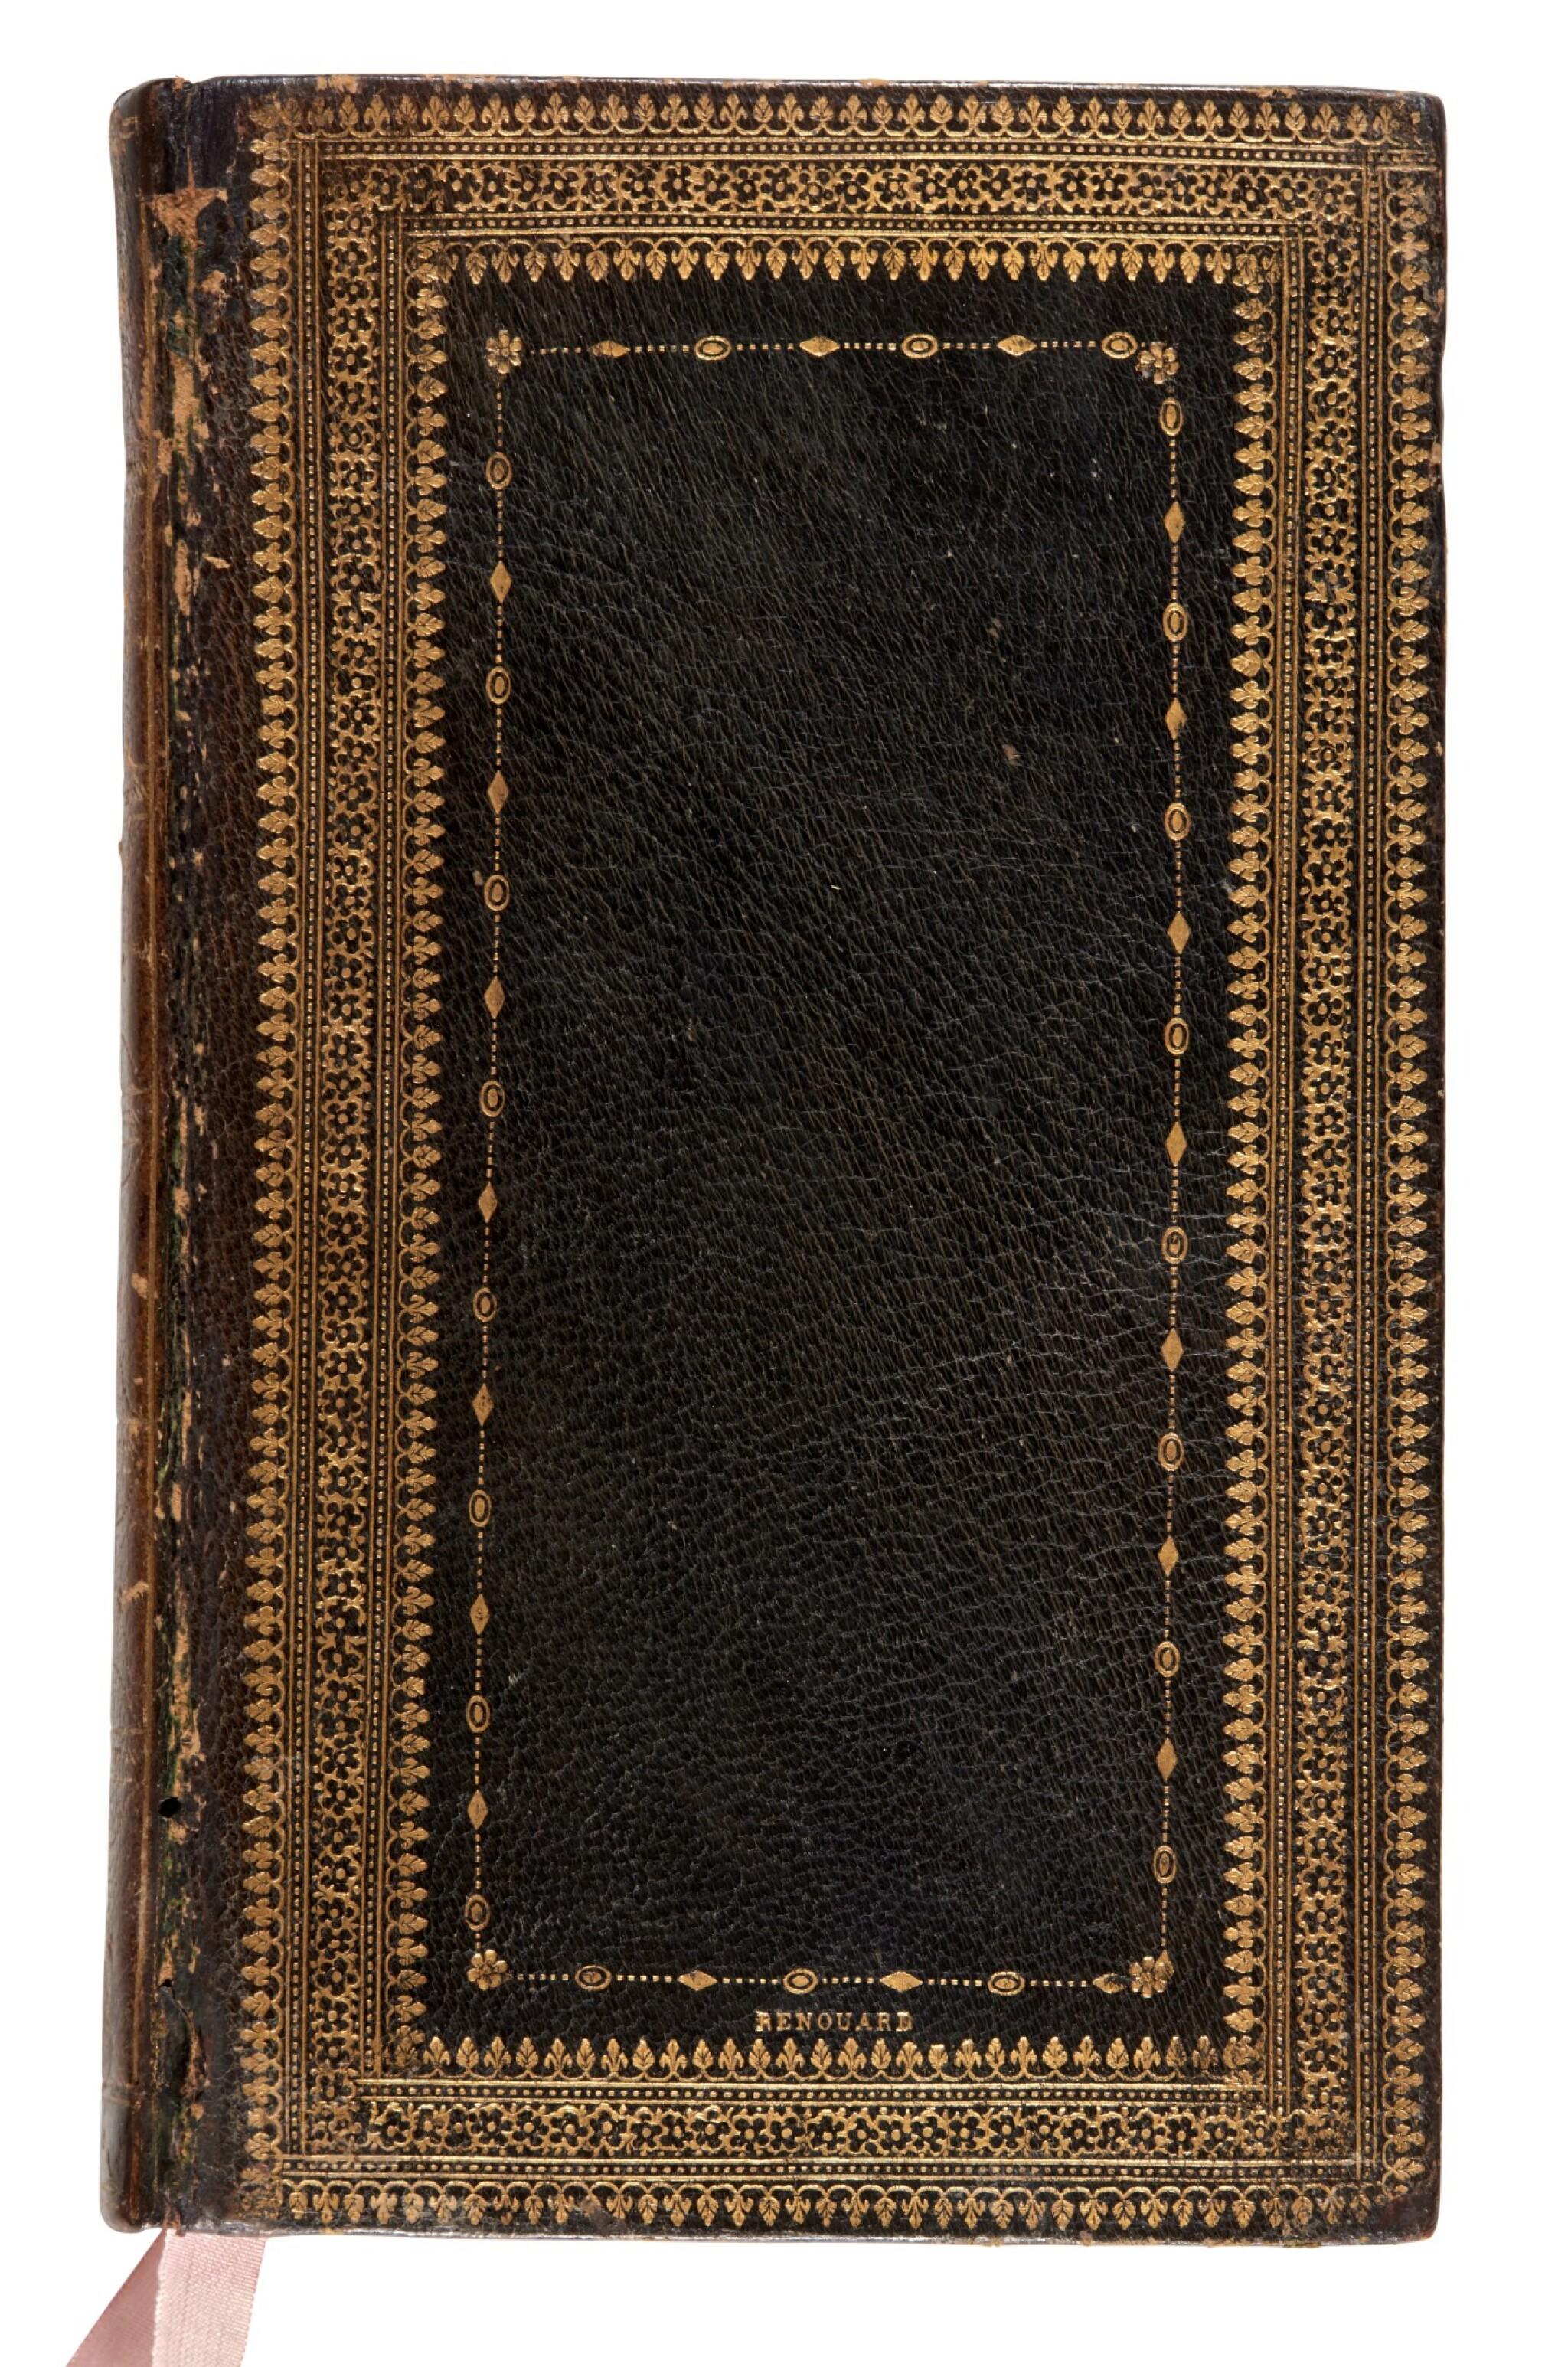 View full screen - View 1 of Lot 240. Statius, [Opera], Venice, Aldus, 1502, navy morocco gilt, Renouard's copy.